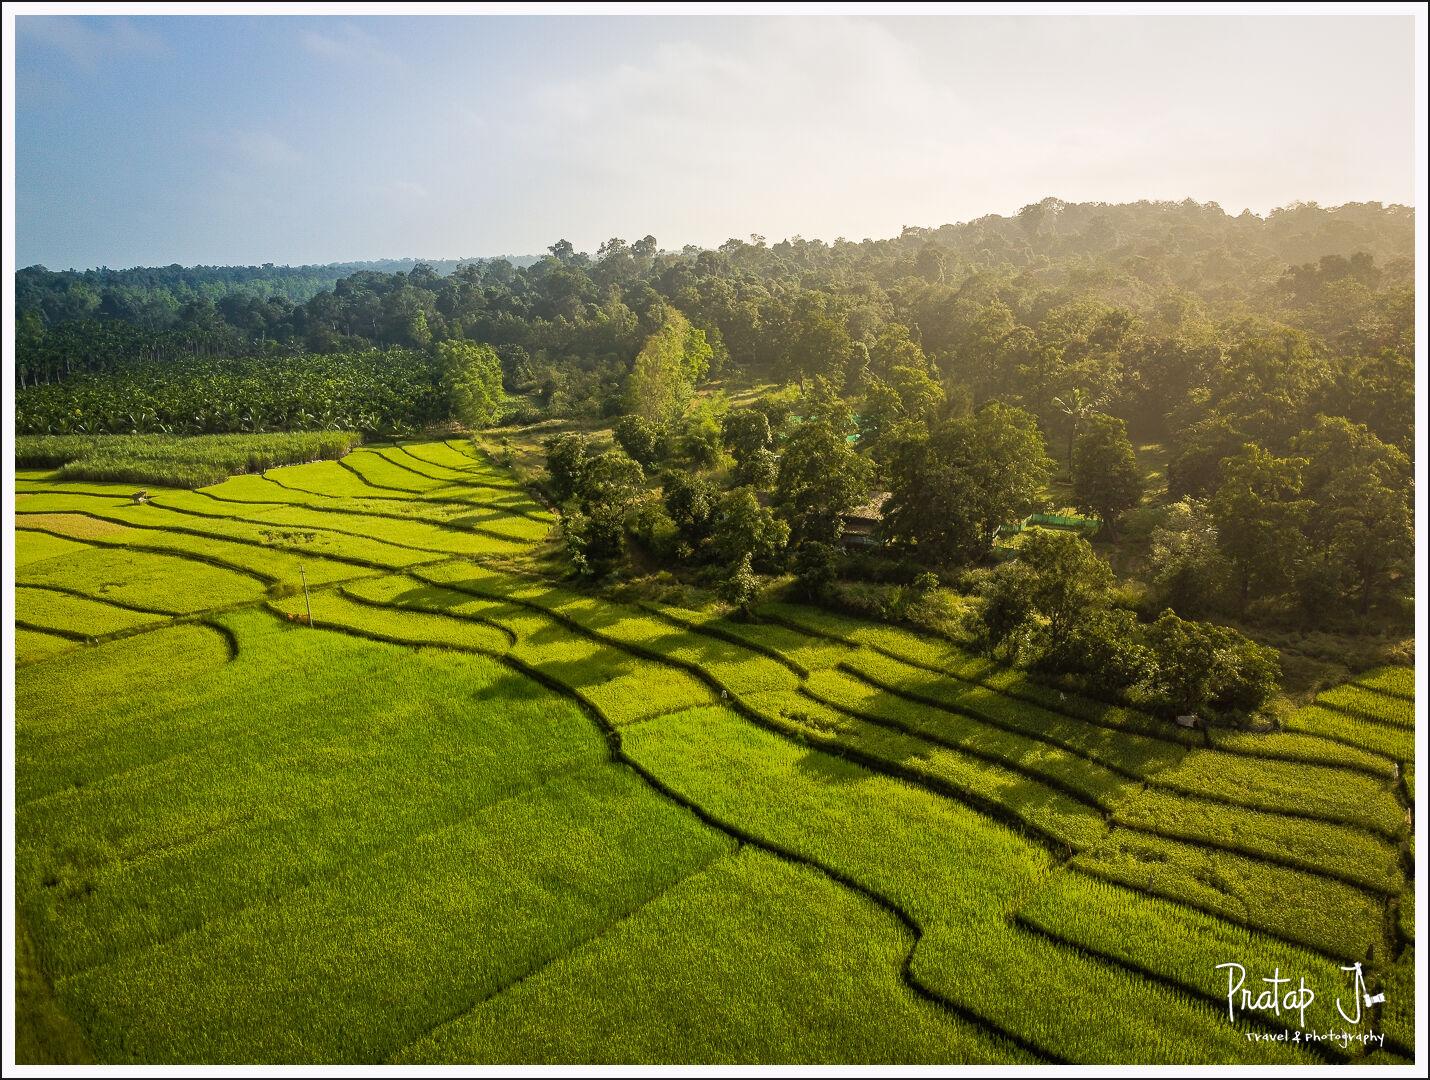 Paddy fields near Sirsi